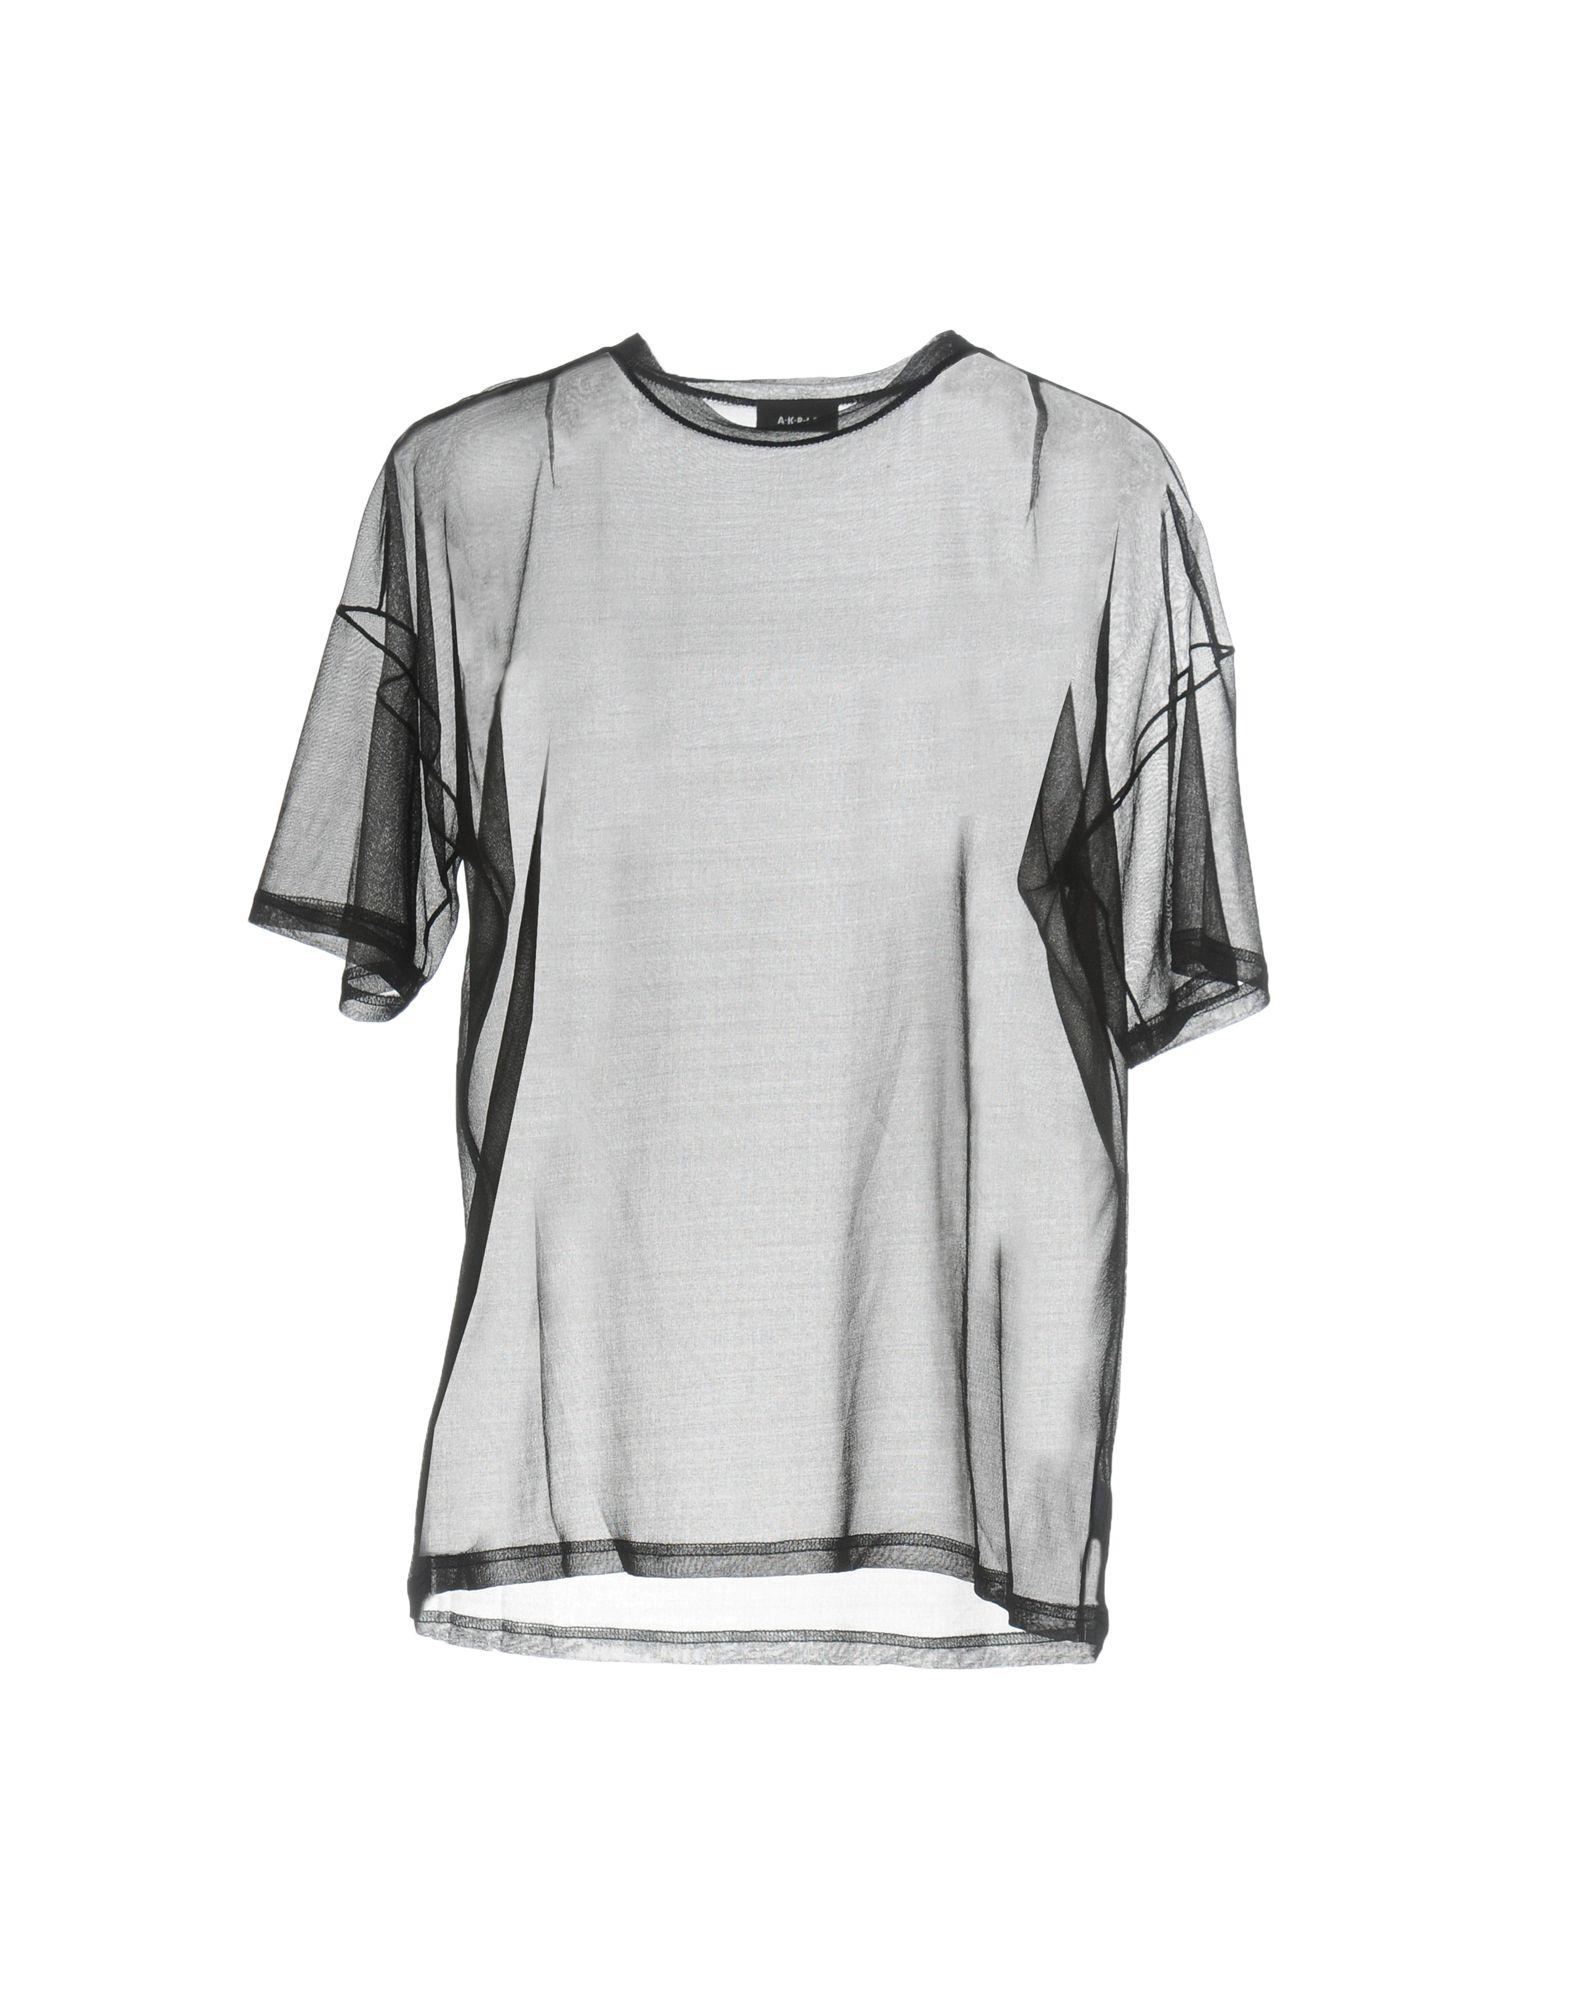 AKRIS レディース T シャツ ブラック 36 シルク 100%